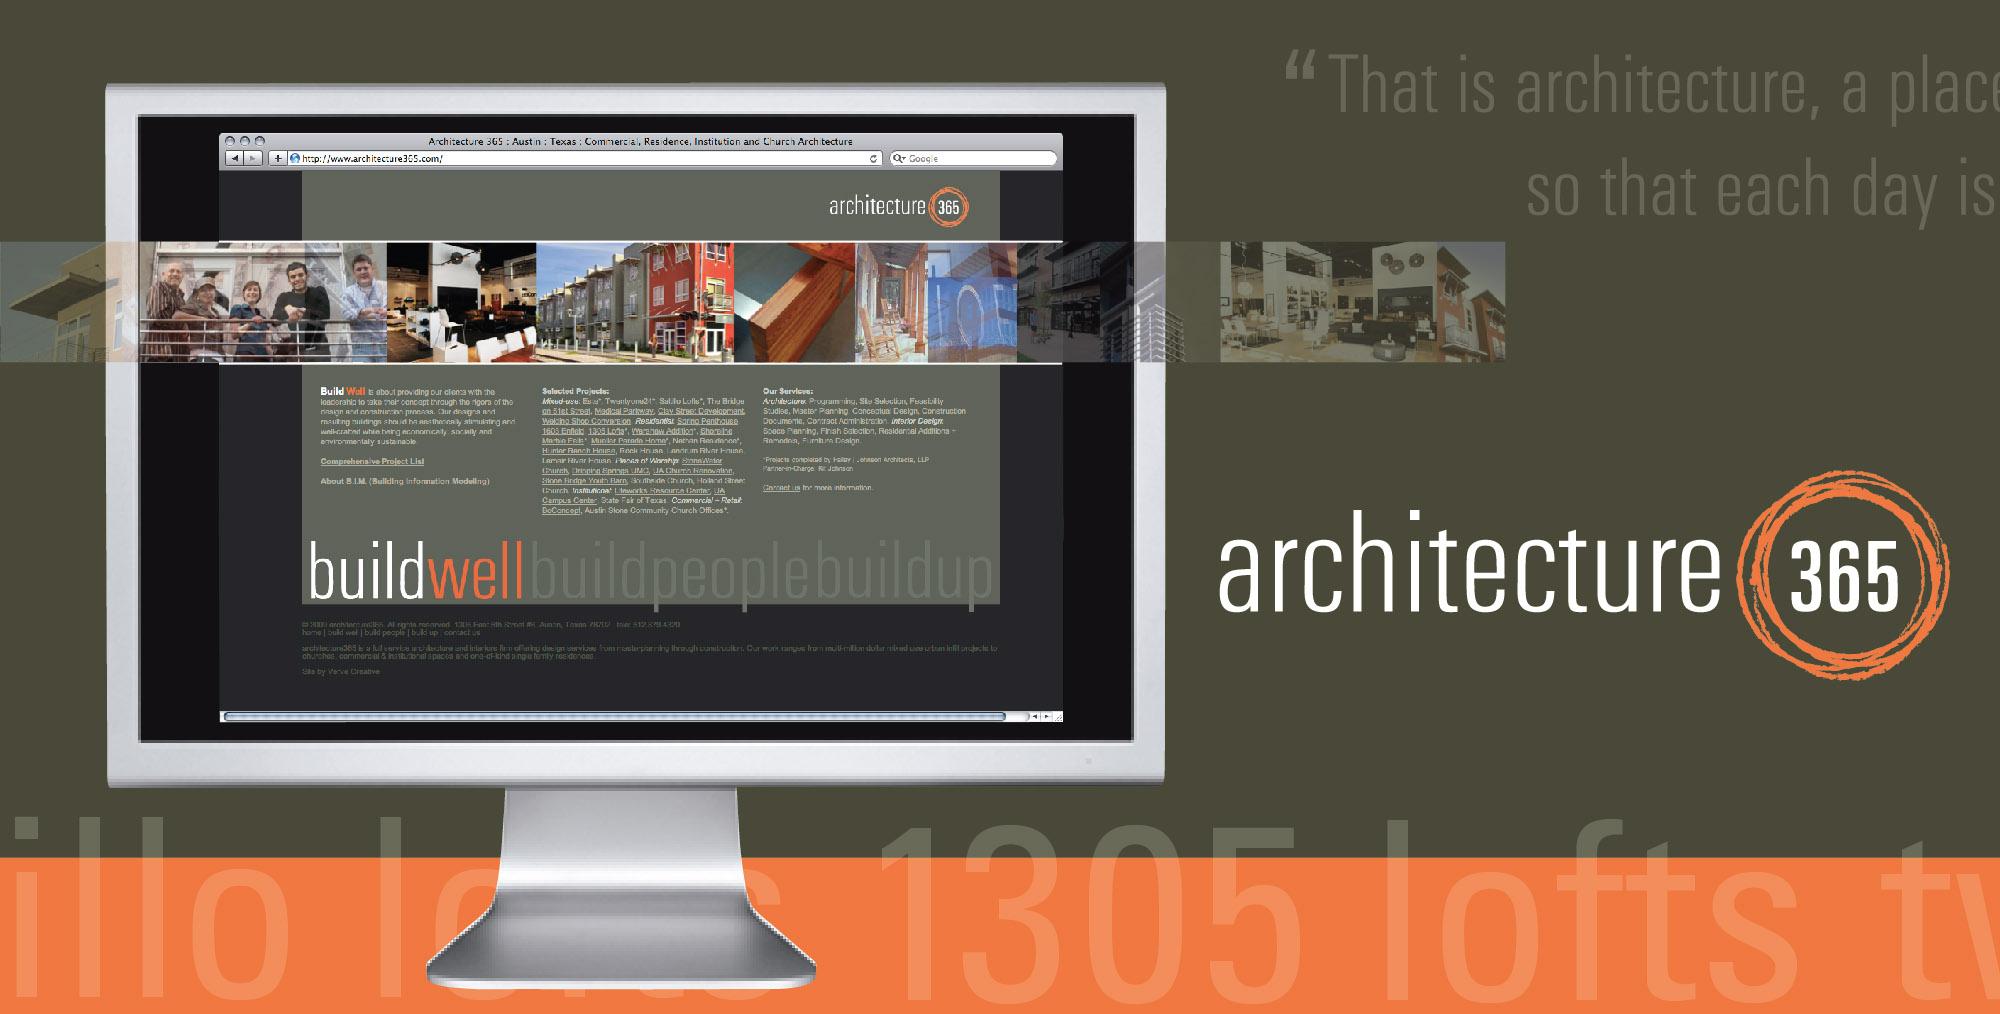 DesignCode : Brand Identity : archcitecture365 : Gallery 1